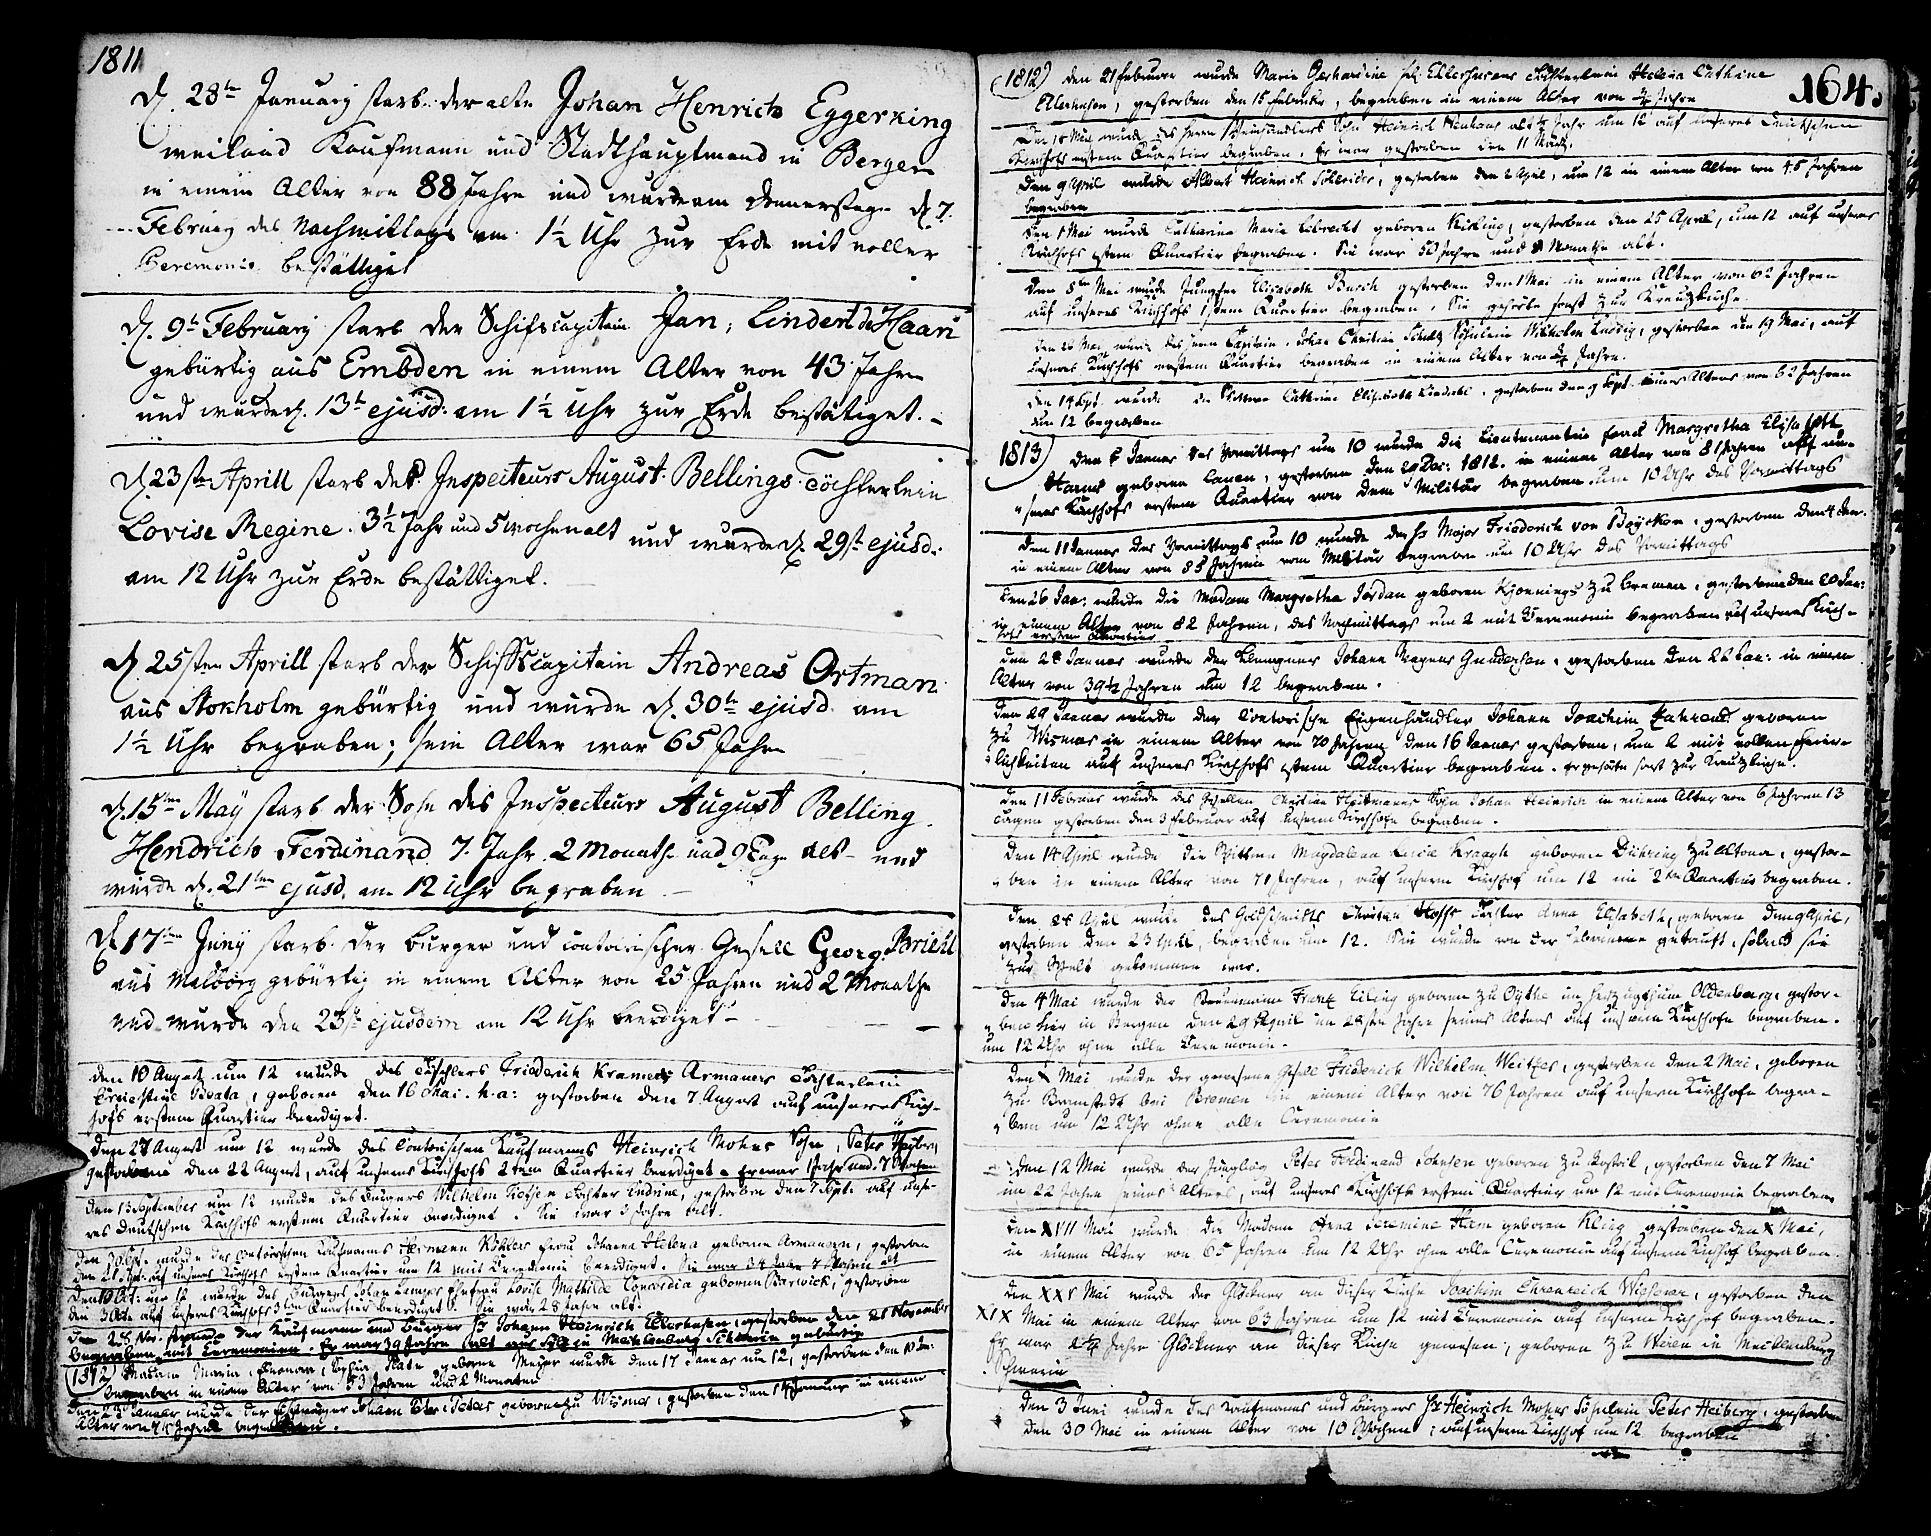 SAB, Mariakirken Sokneprestembete, H/Haa/L0003: Ministerialbok nr. A 3, 1786-1815, s. 164